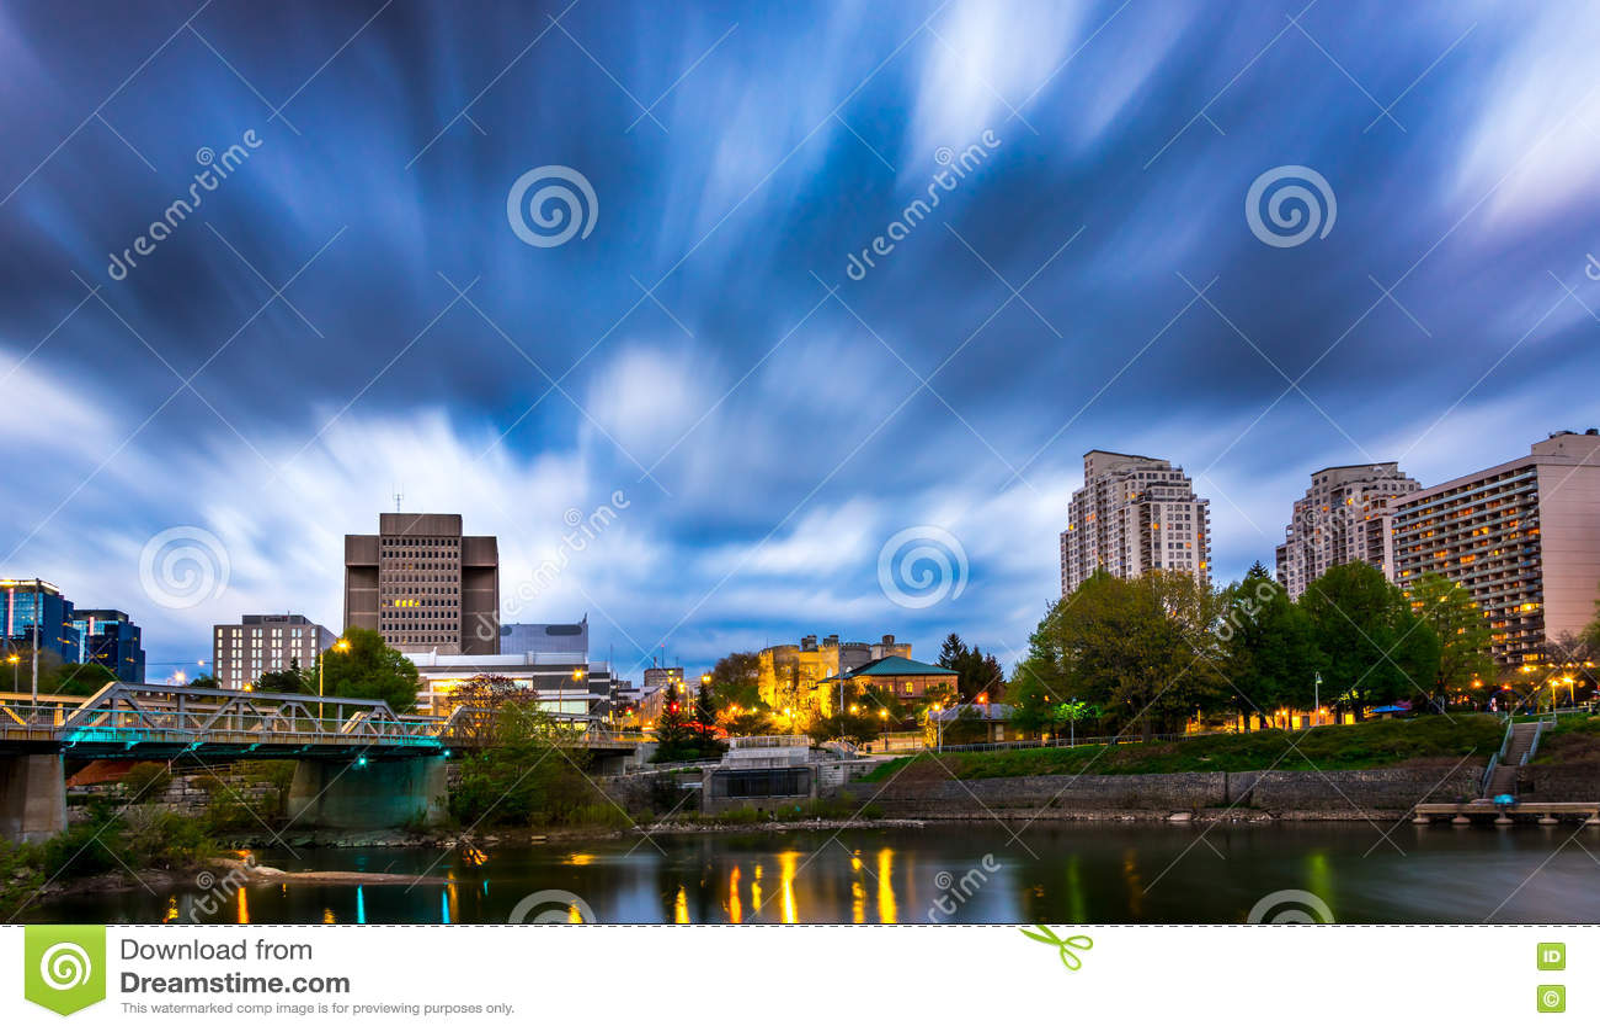 Downtown London Ontario Canada Stock Photo Image 71416810